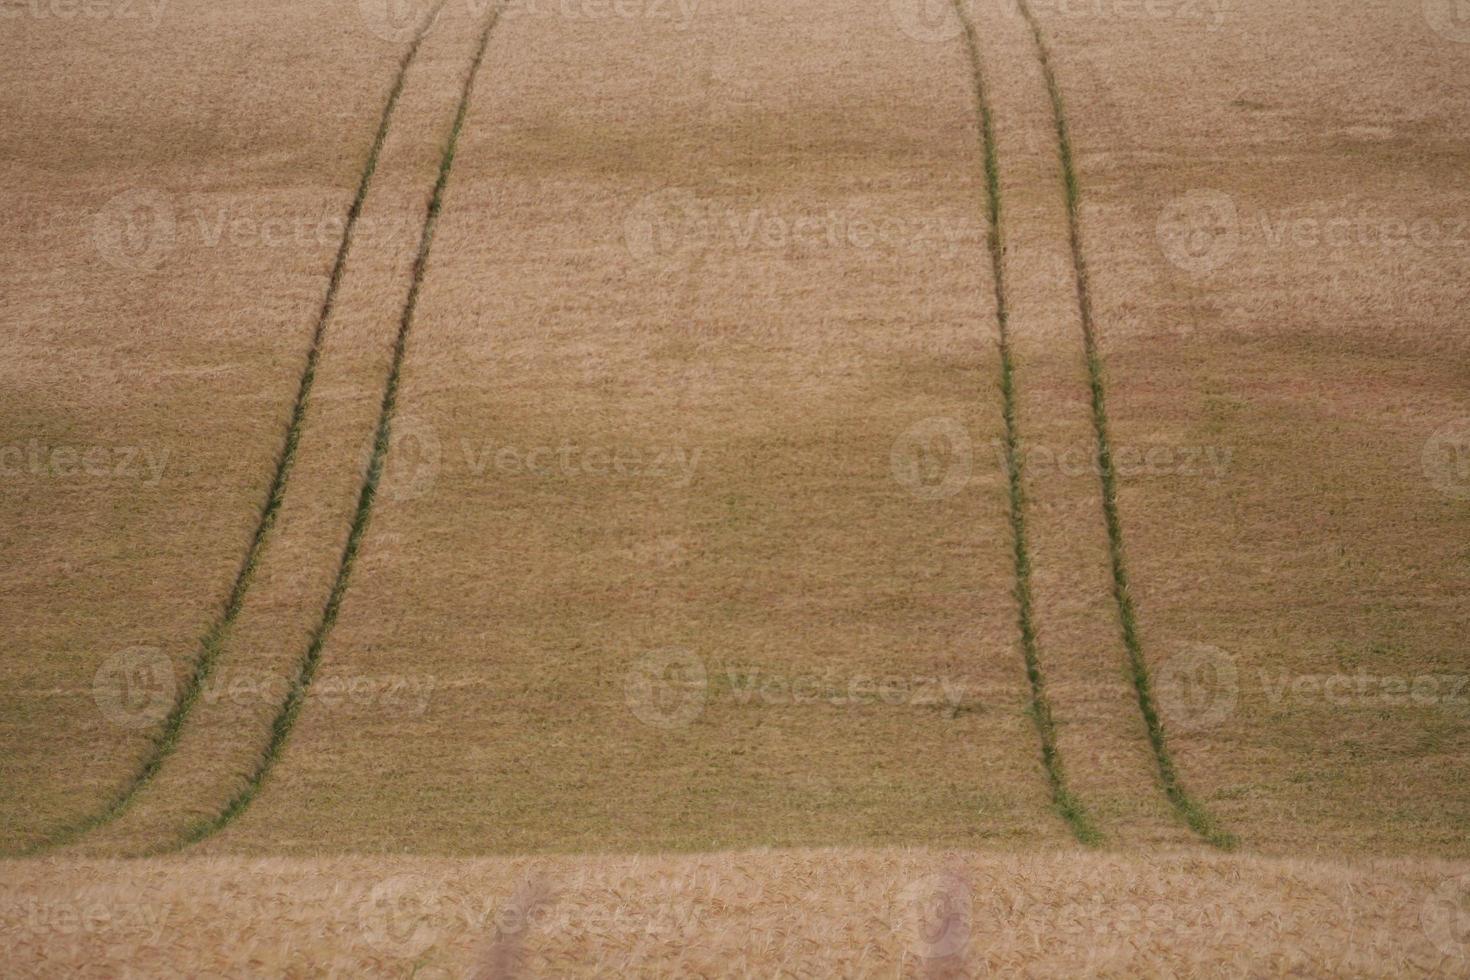 Weizenfeldspuren foto